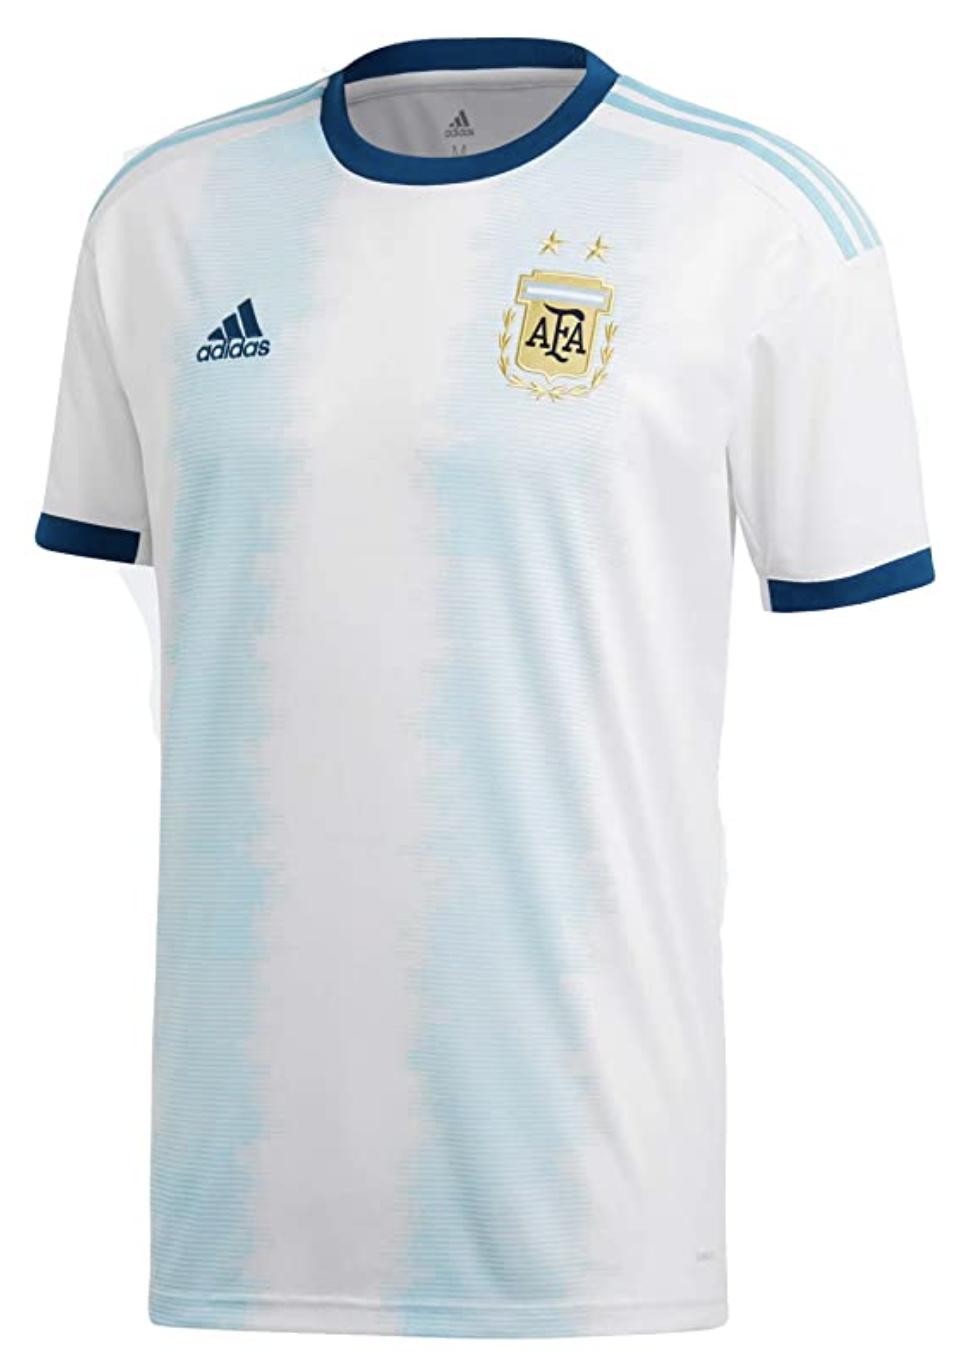 Adidas Argentina Official Home Jersey Shirt 2018